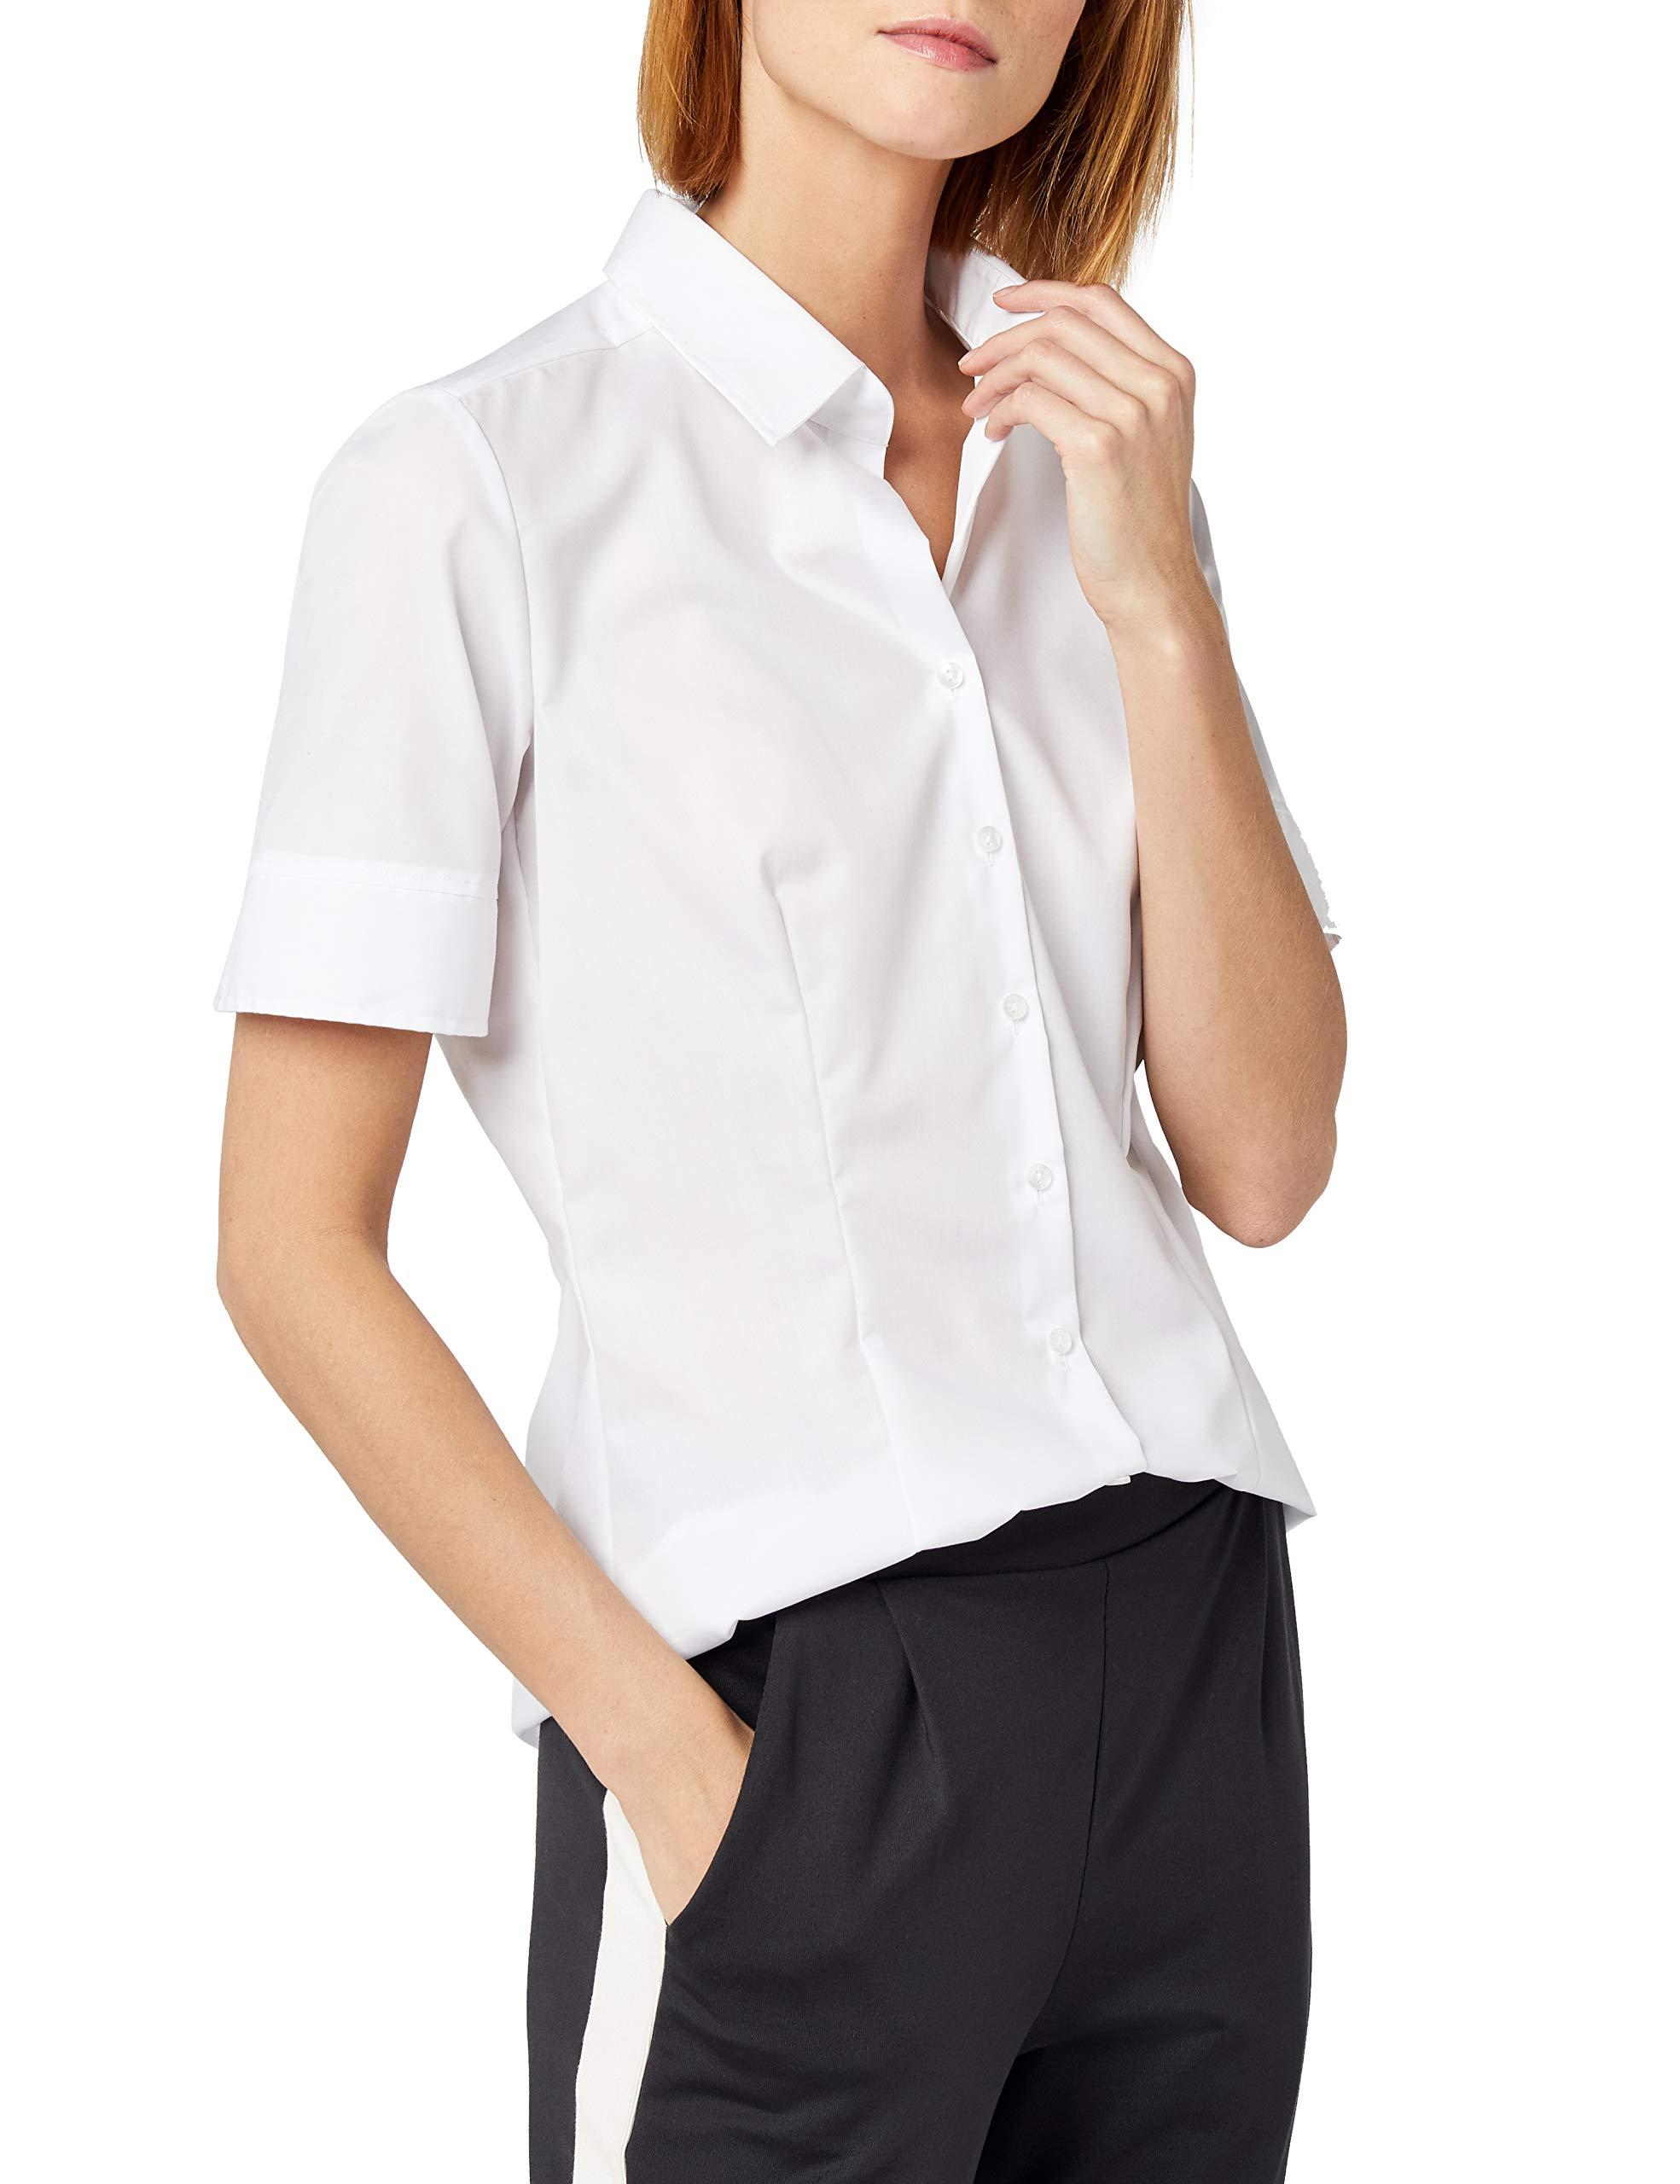 42 Blanc1TailleFr44taille Seidensticker080605 Femme Chemise Fabricant qMpUVSjLGz